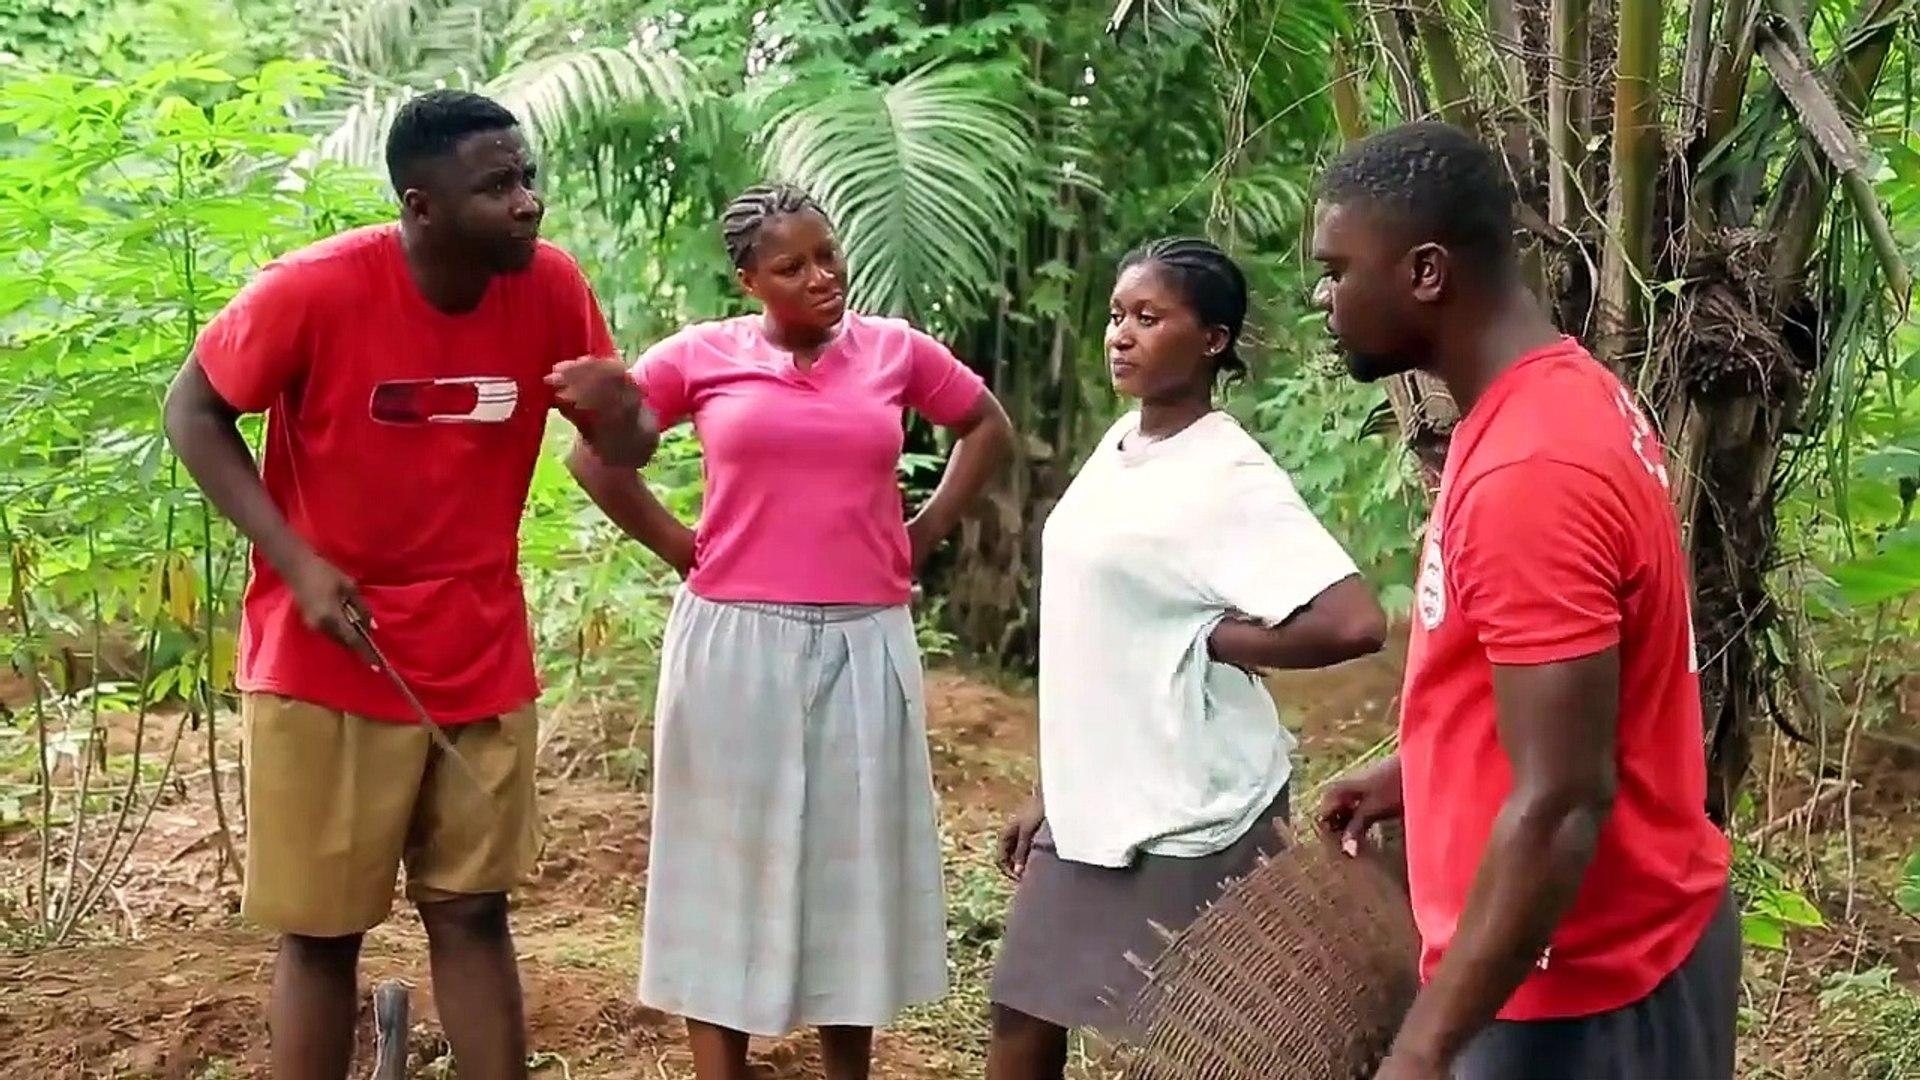 HOW MY HUSBAND'S BROTHERS TURNED ME MAD{MAD WIDOWS2}- 2019 NIGERIAN MOVIES